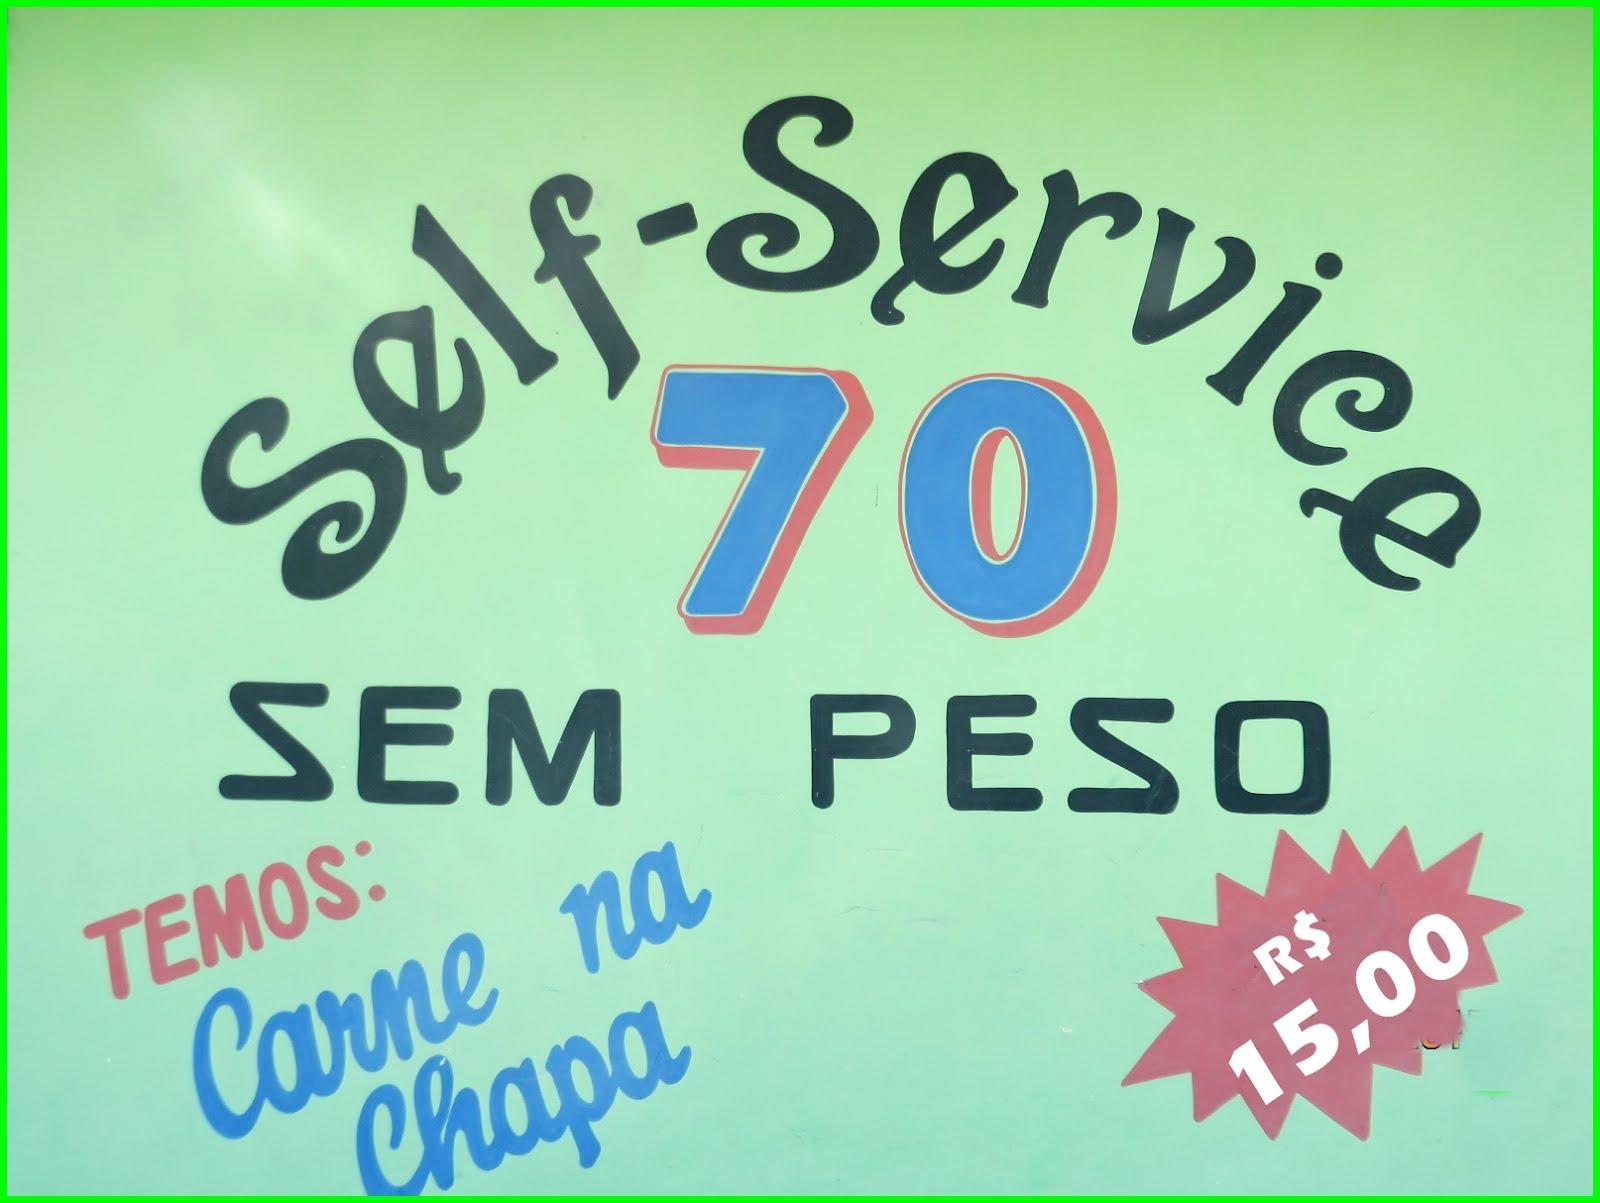 Self-Service 70